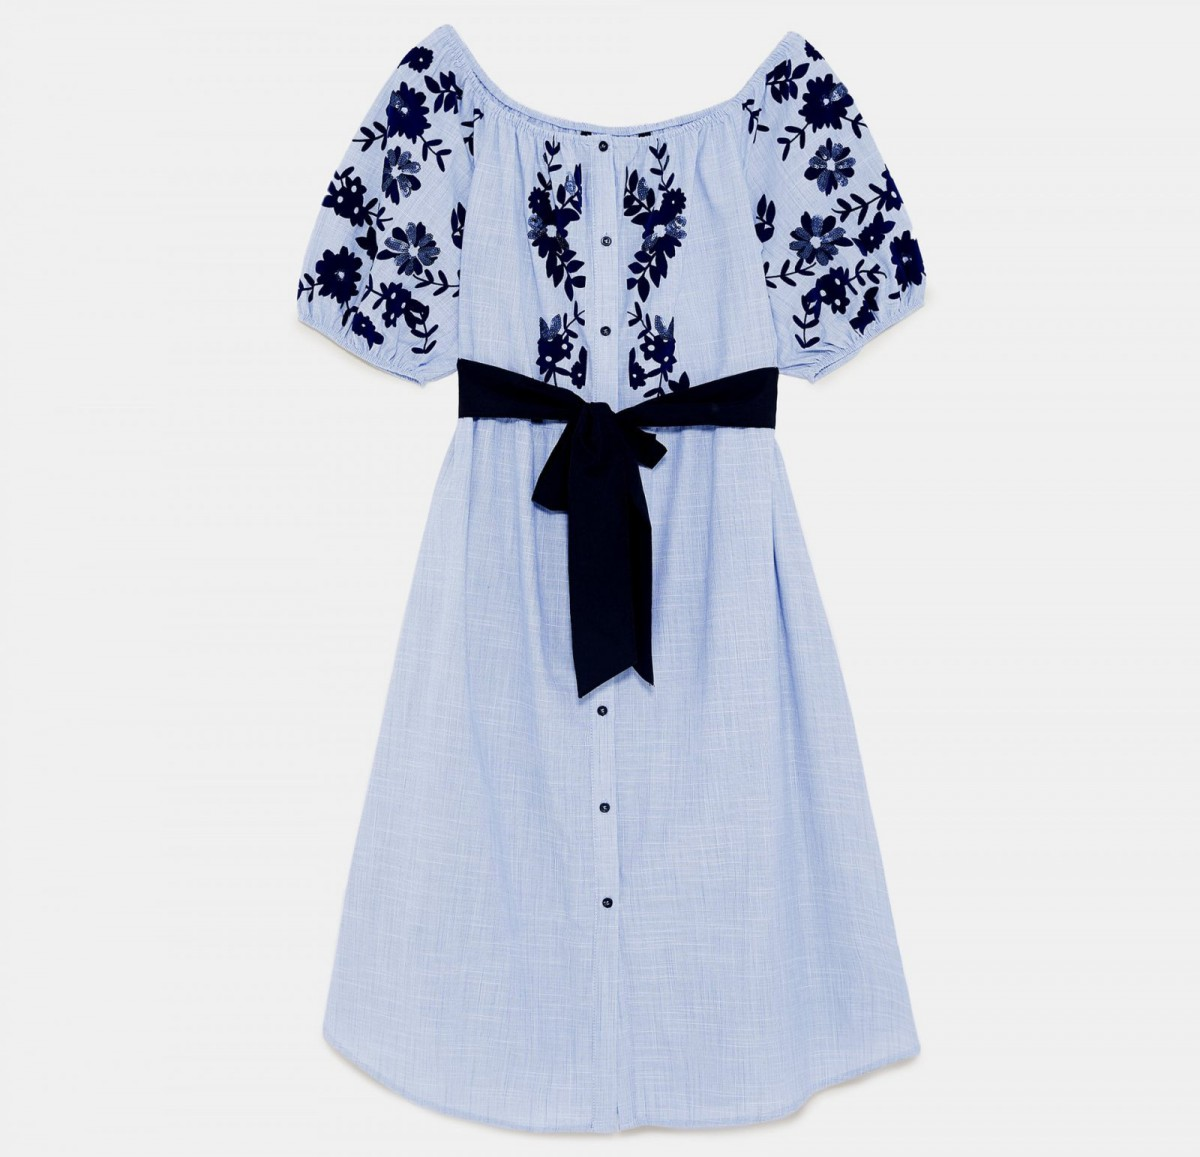 Vestido estampado flocado de Zara, por 39,95 euros